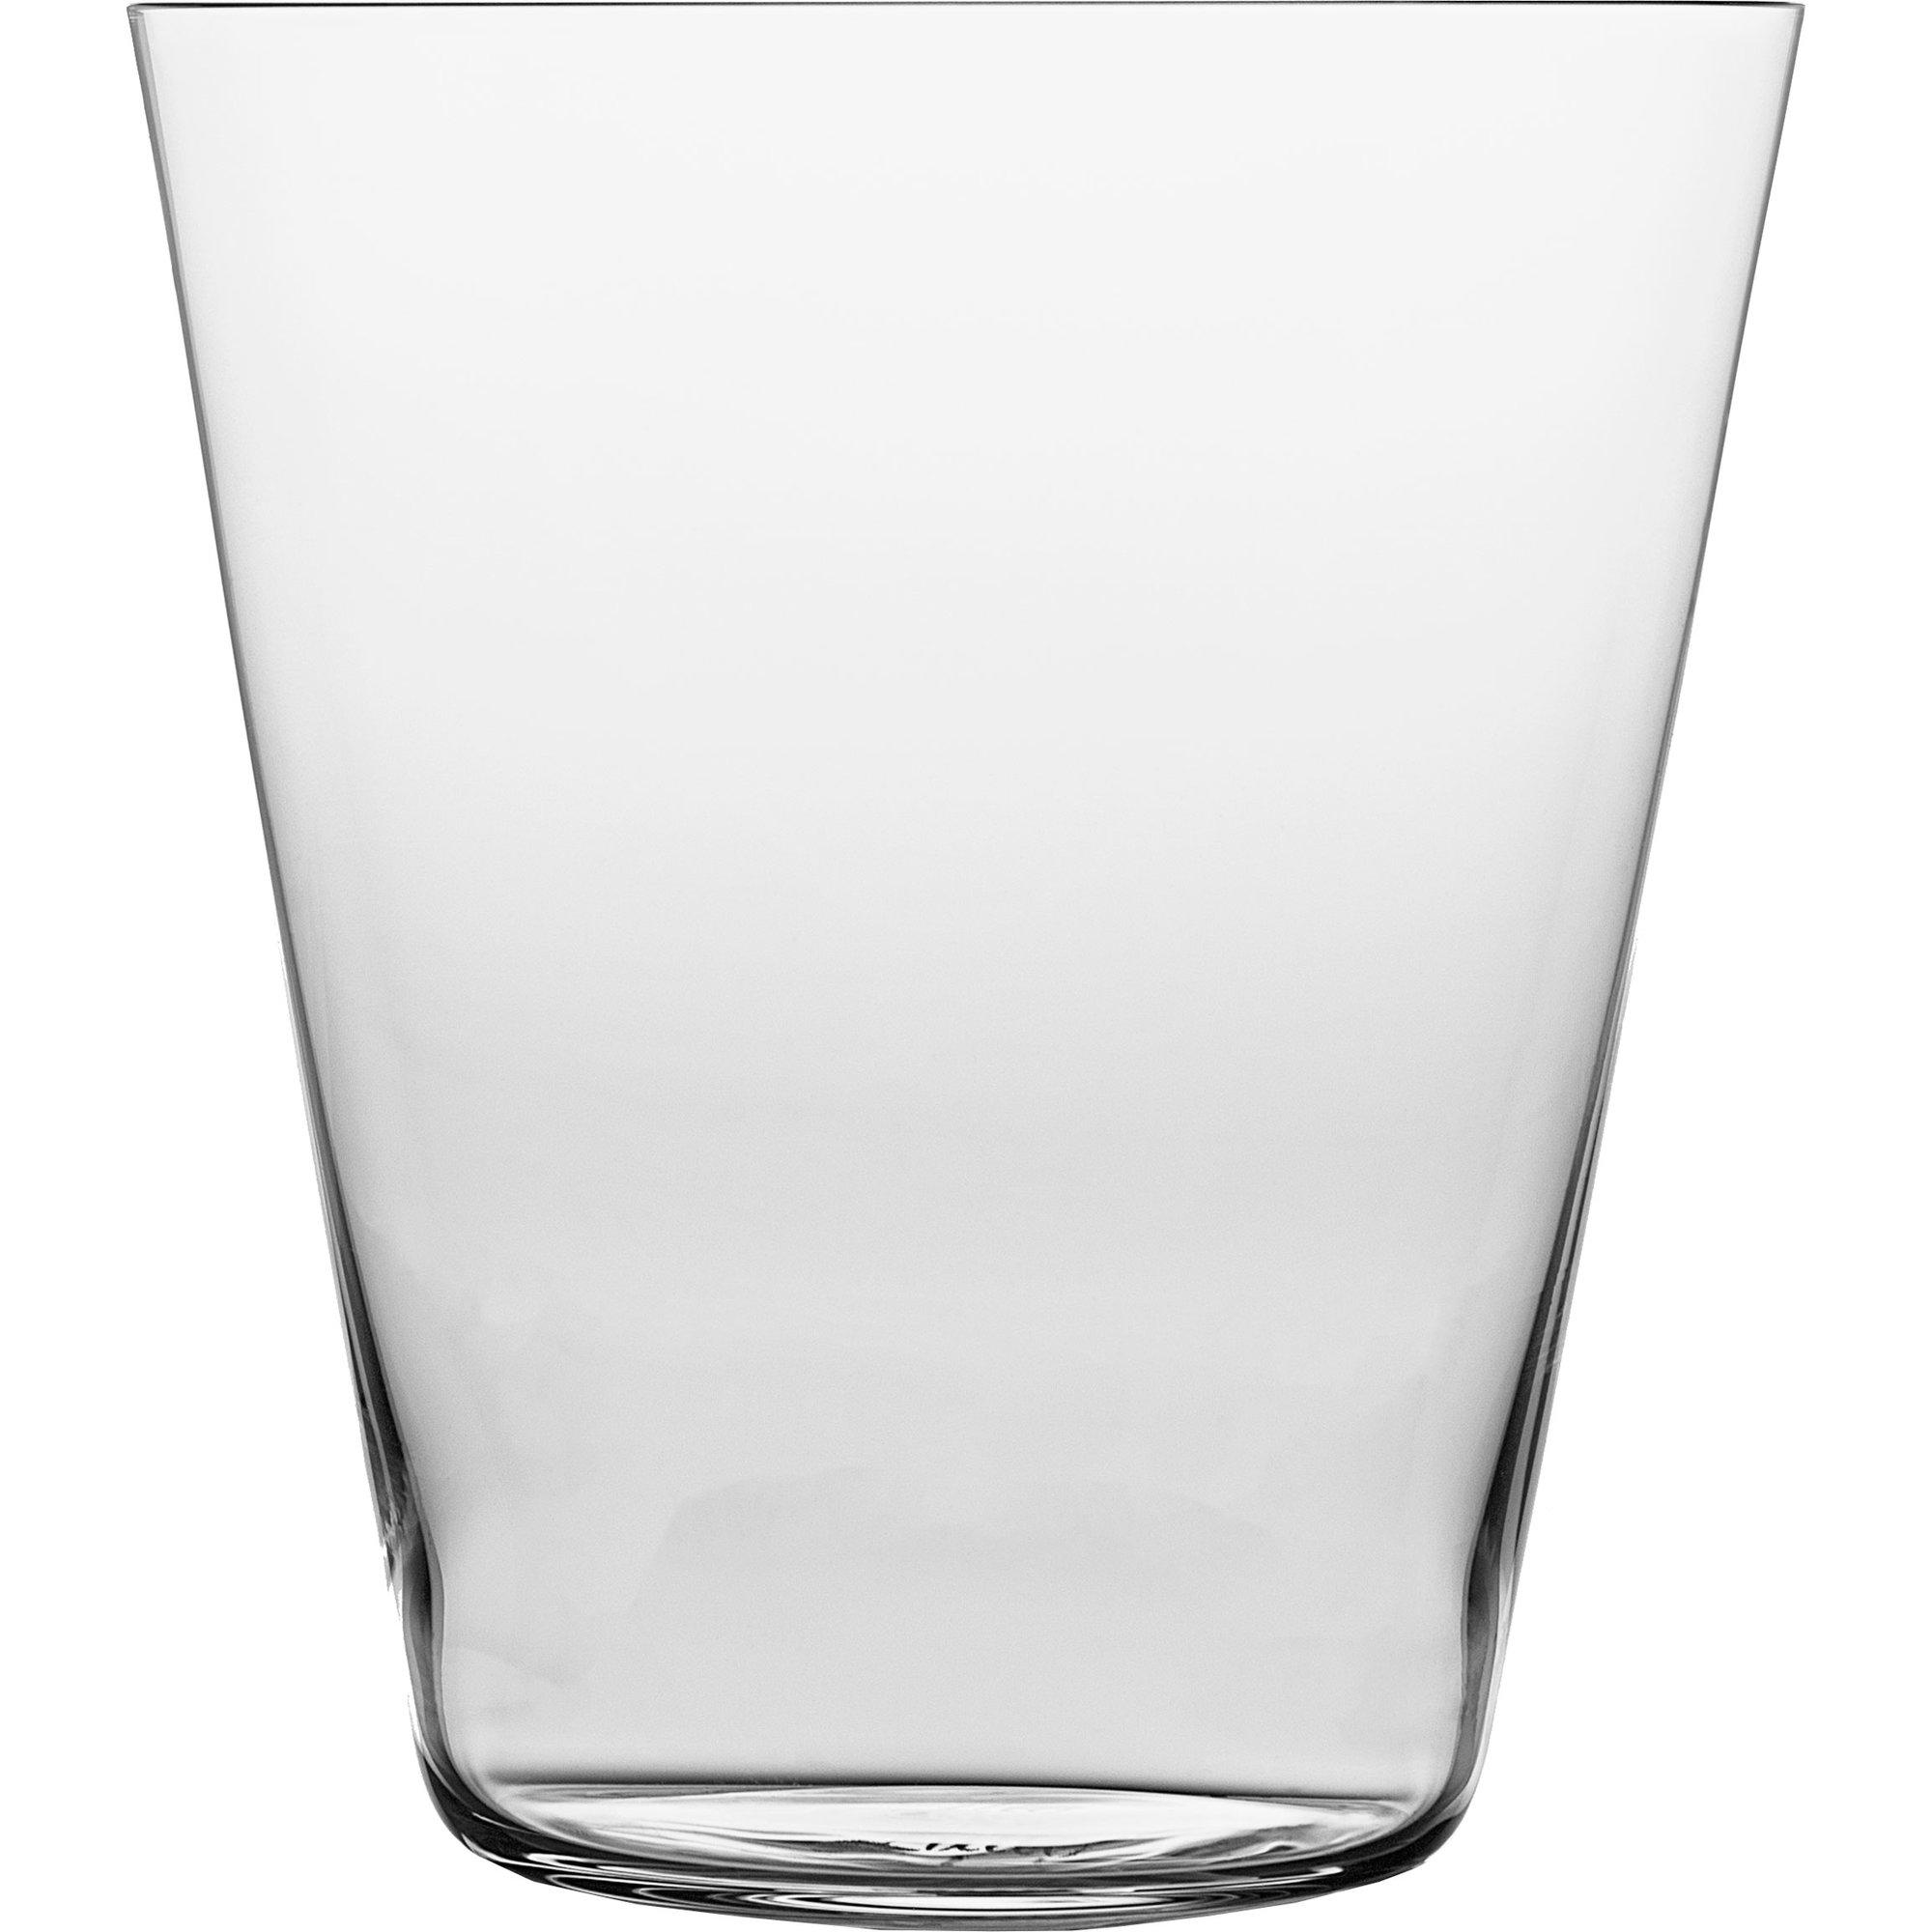 Zalto Coupe Crystal Clear vattenglas 380 ml. 1 st.